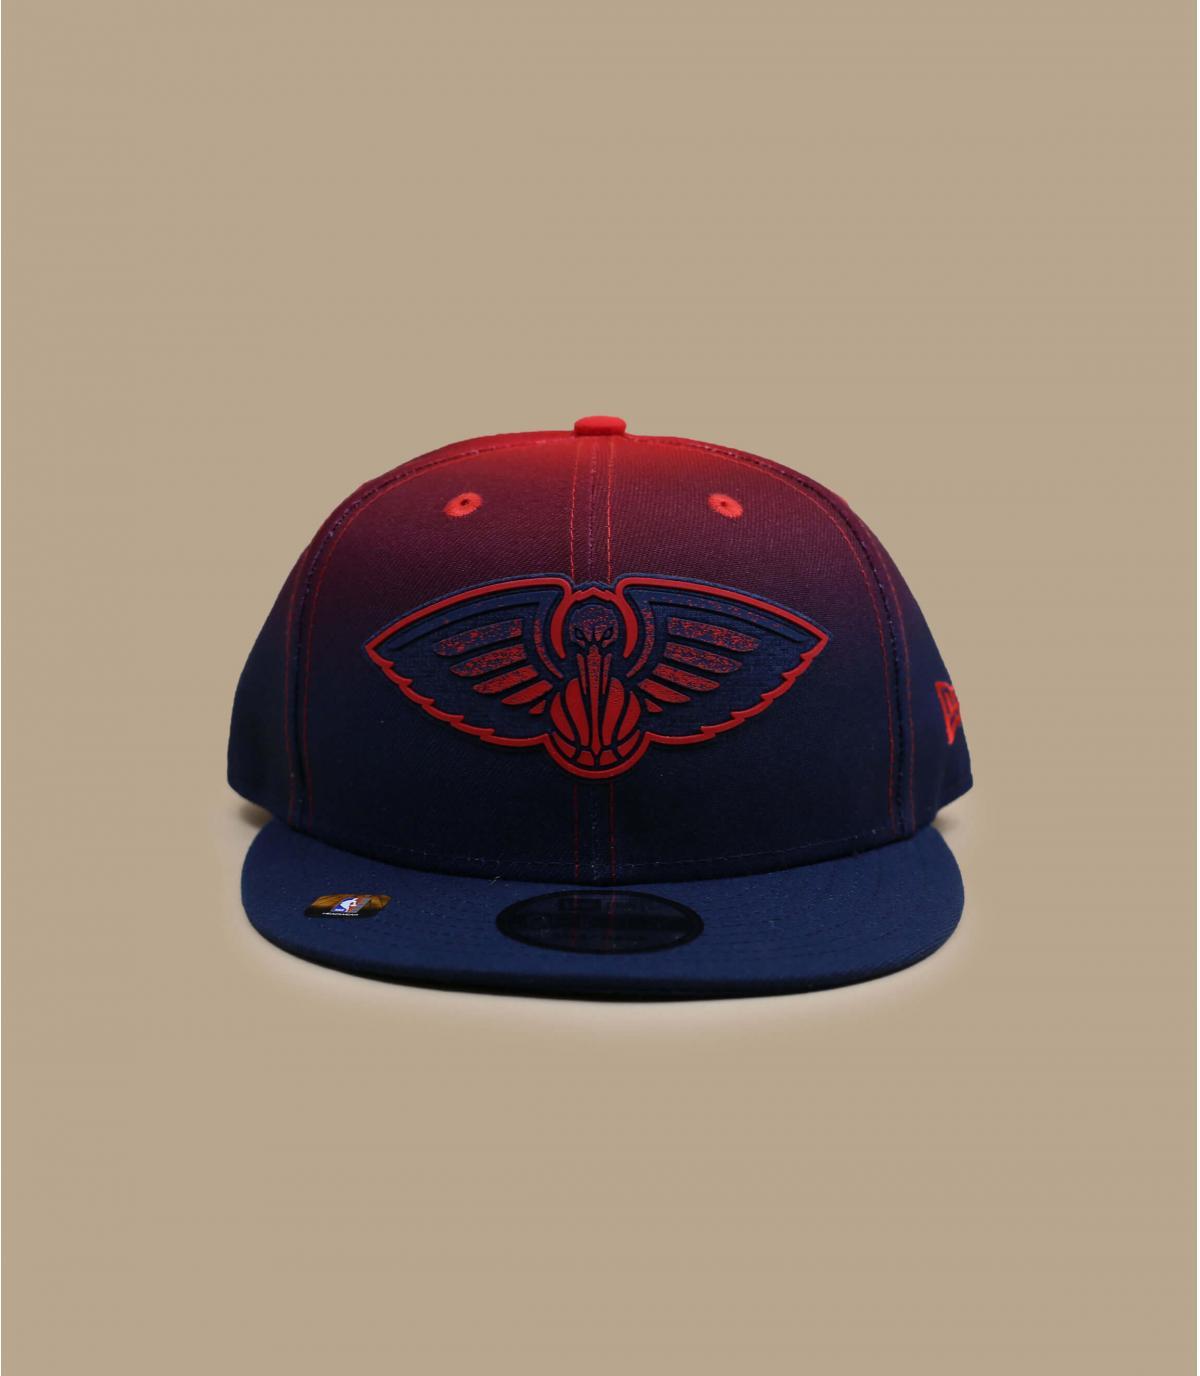 casquette Pelicans rouge